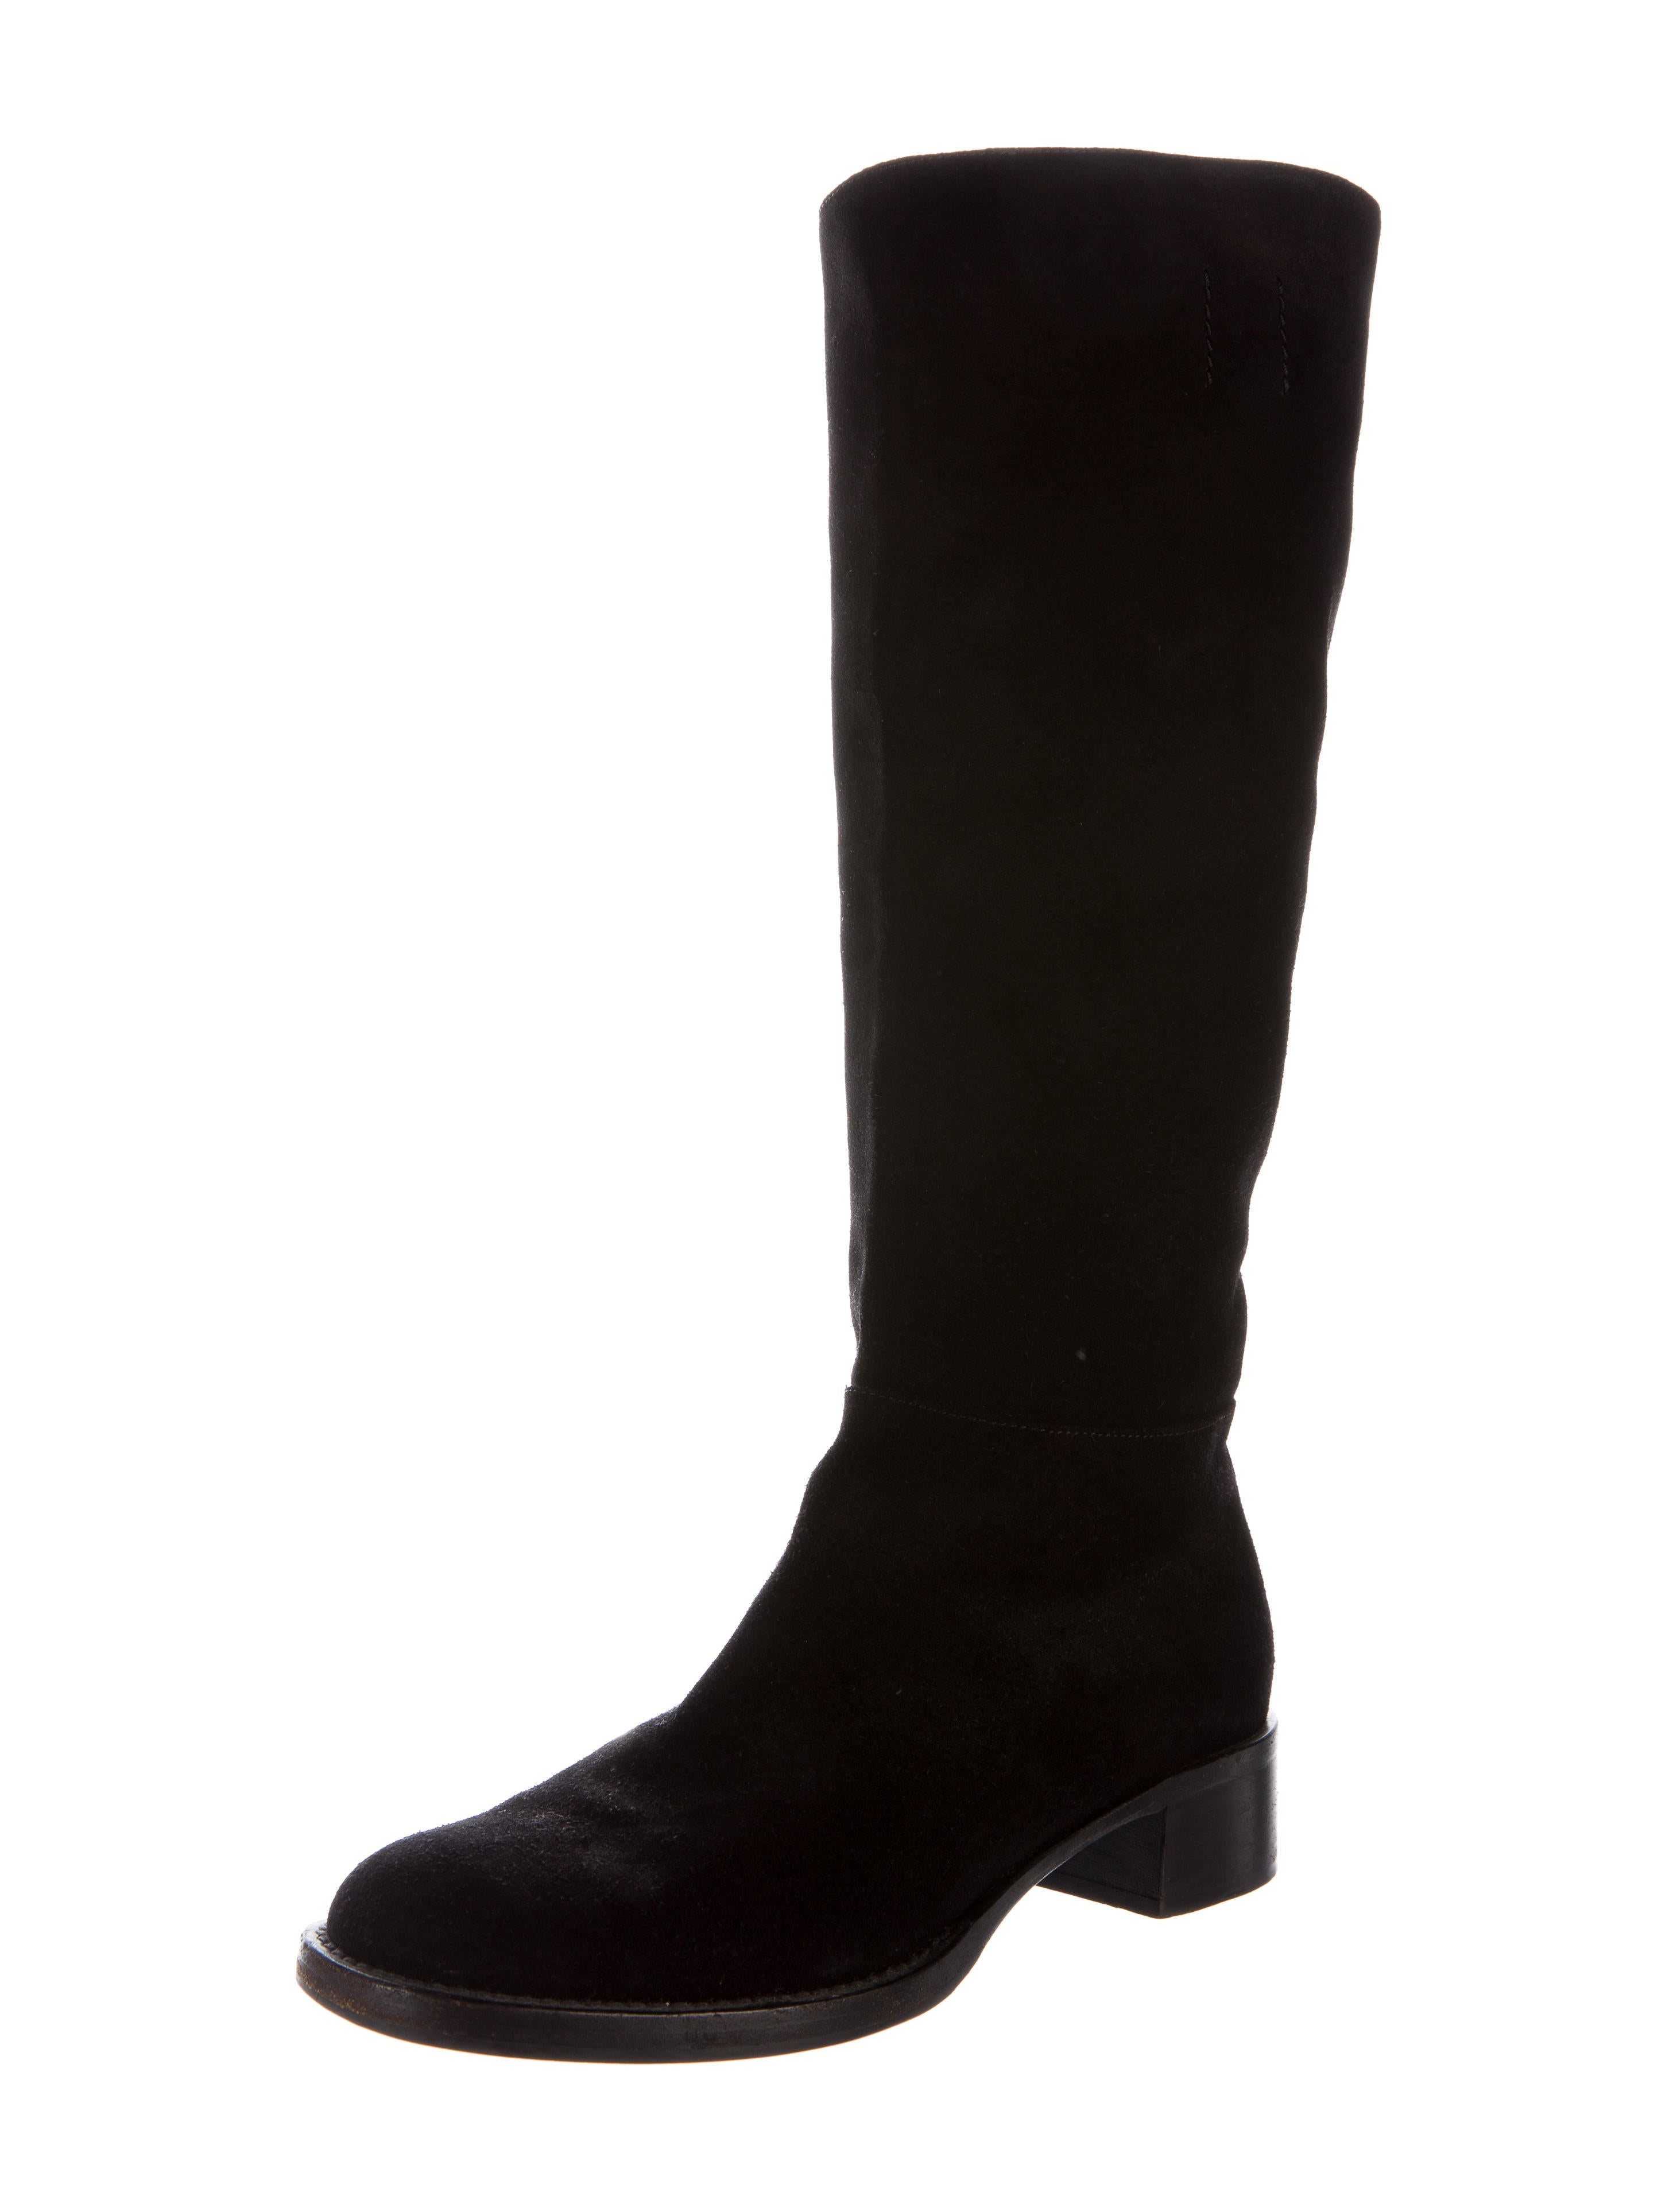 prada suede knee high boots shoes pra108981 the realreal